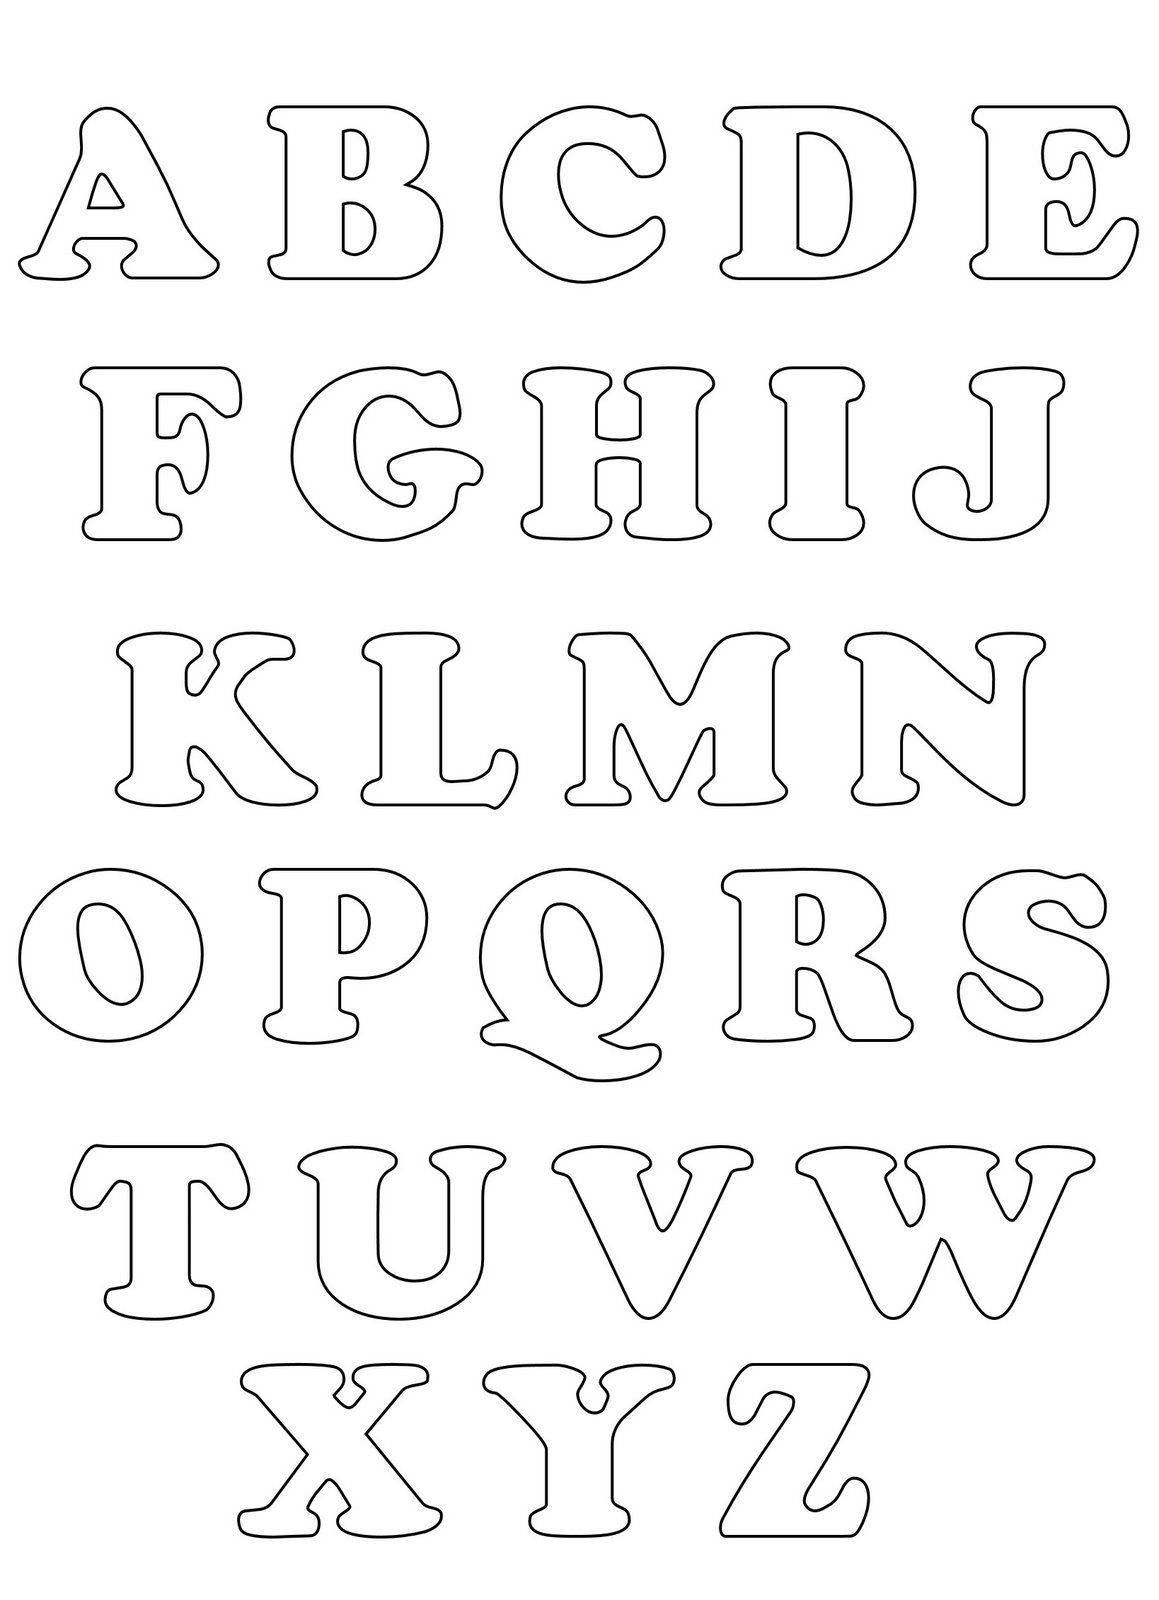 Dibujos de letras en foami moldes - Imagui | Goma eva | Pinterest ...